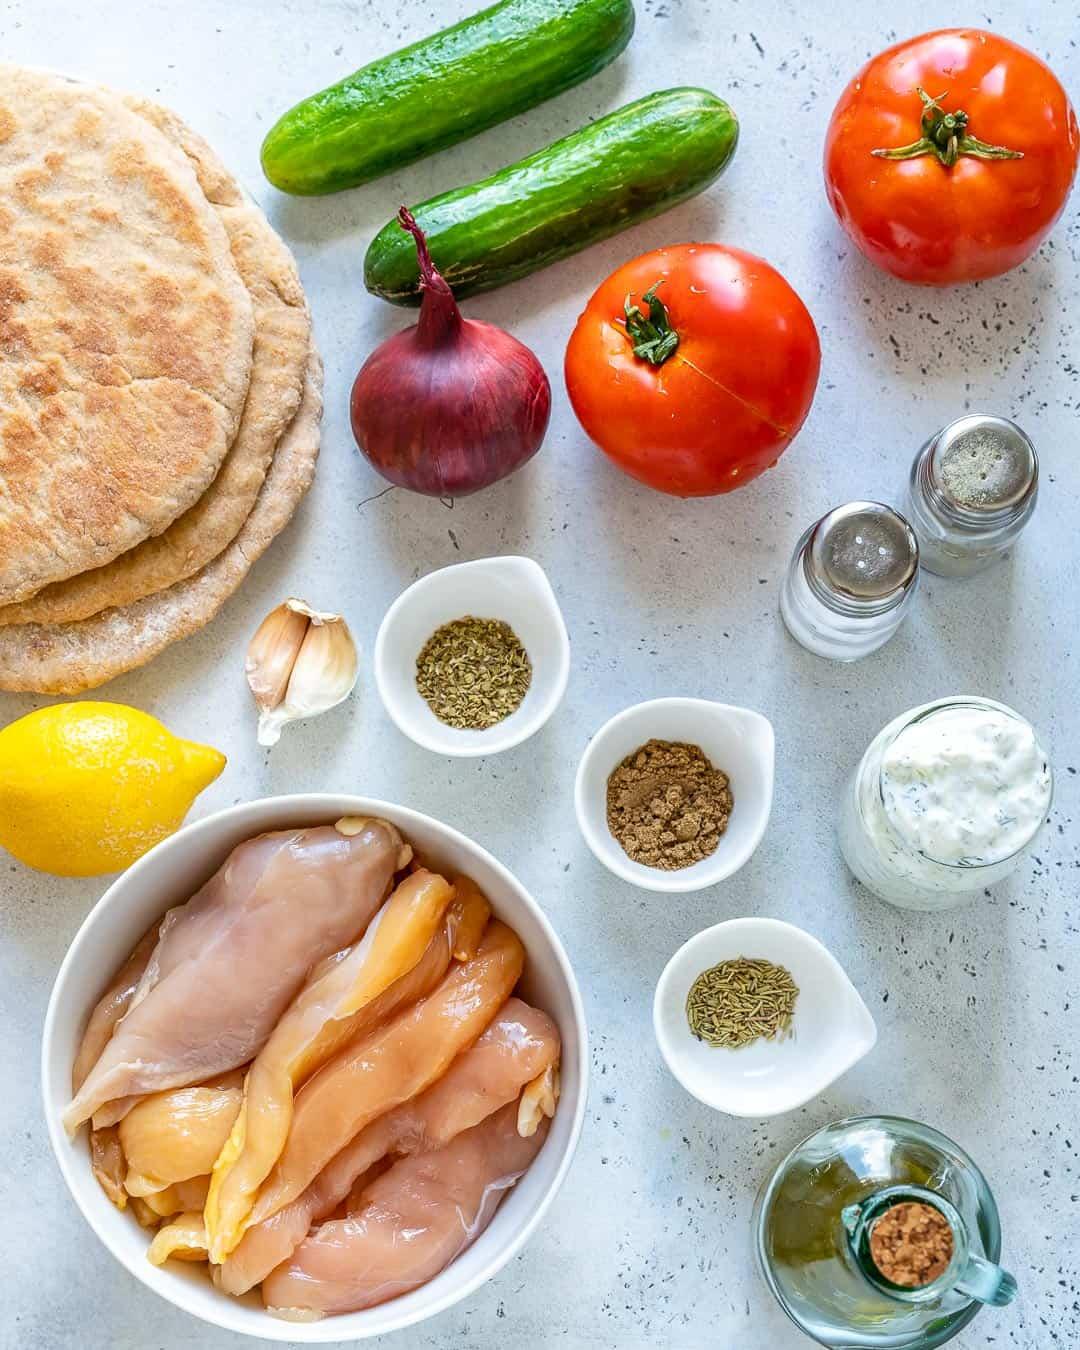 ingredients for Grilled Chicken Gyro Sandwich